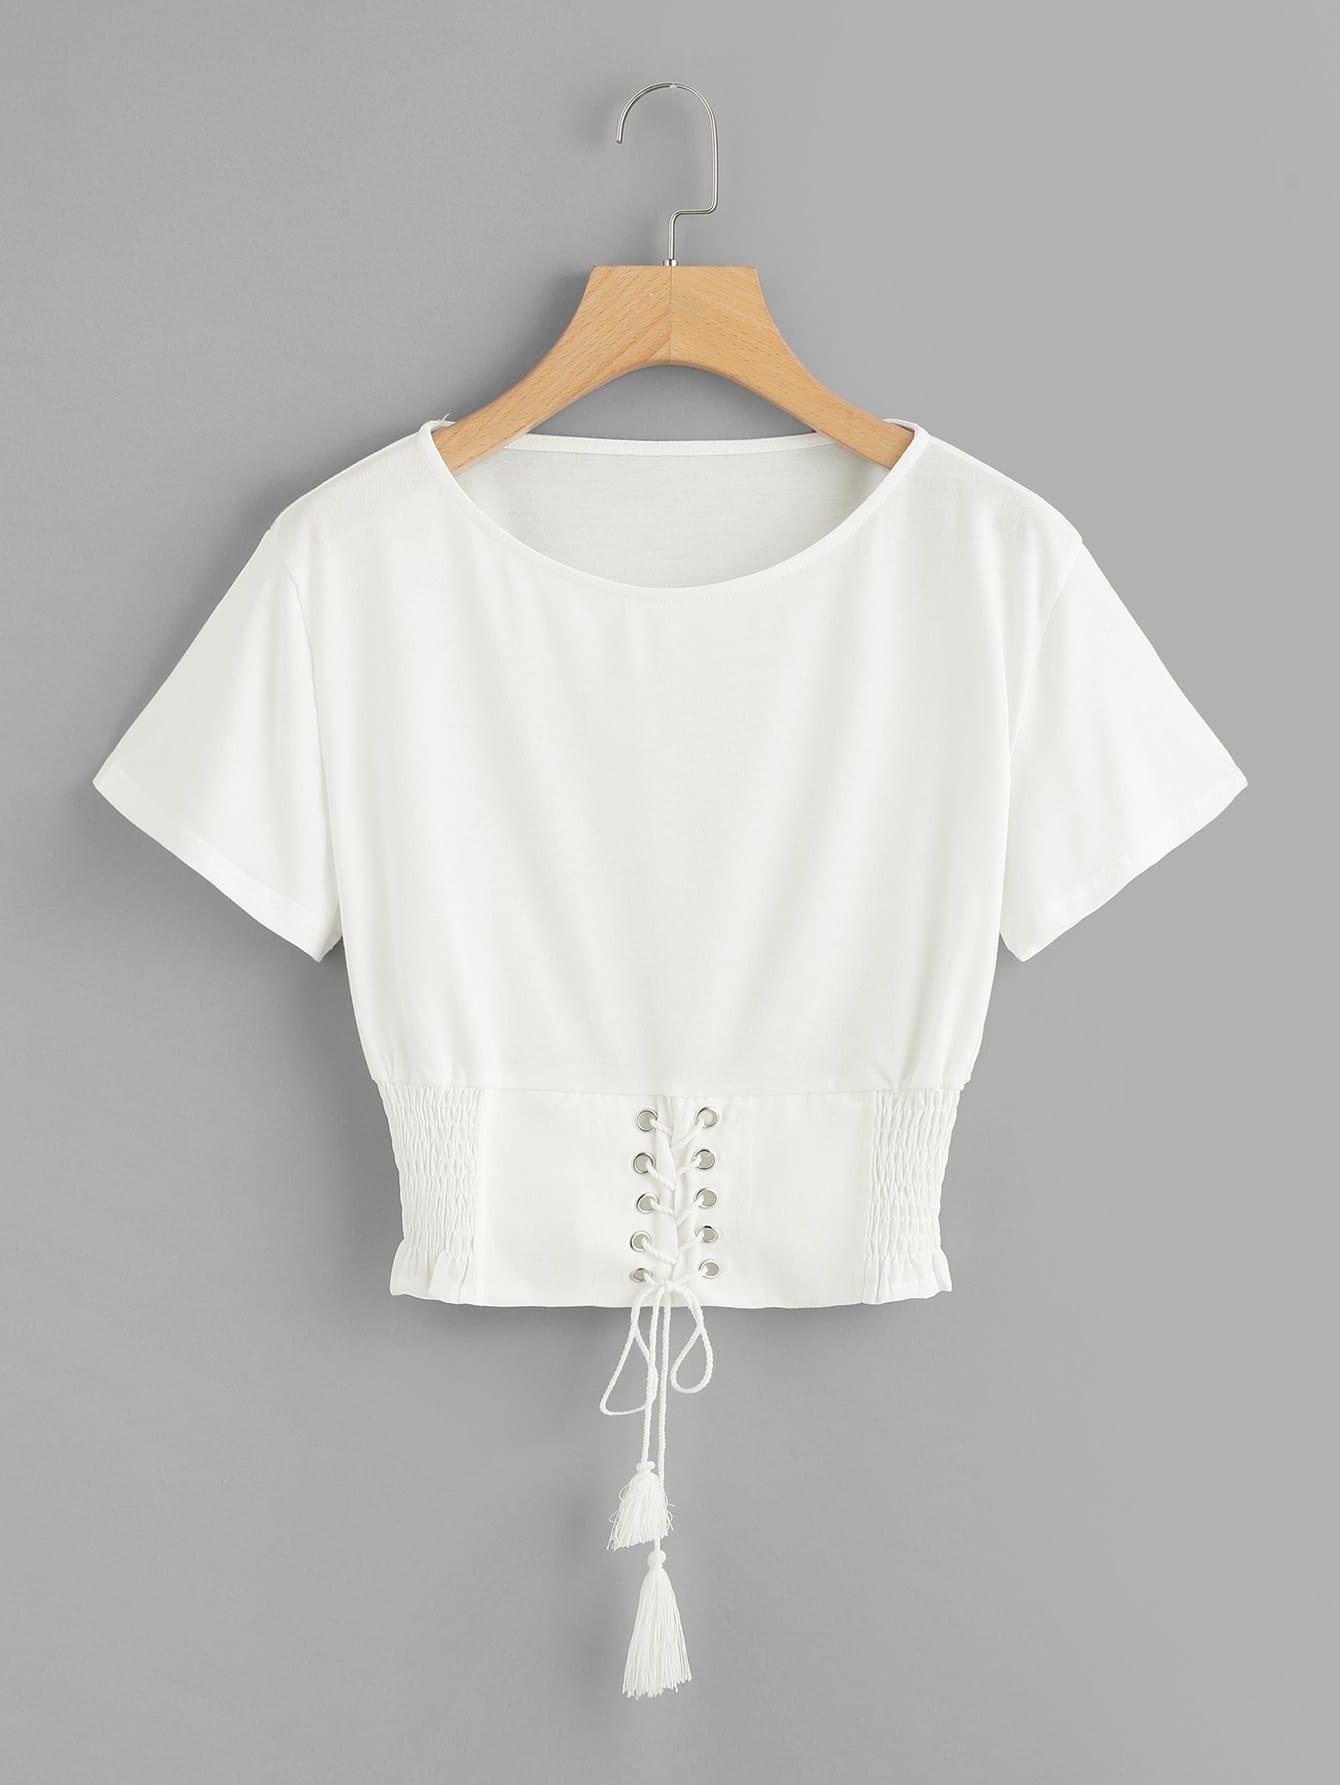 Corset Lace Up Detail T-shirt camouflage lace up t shirt